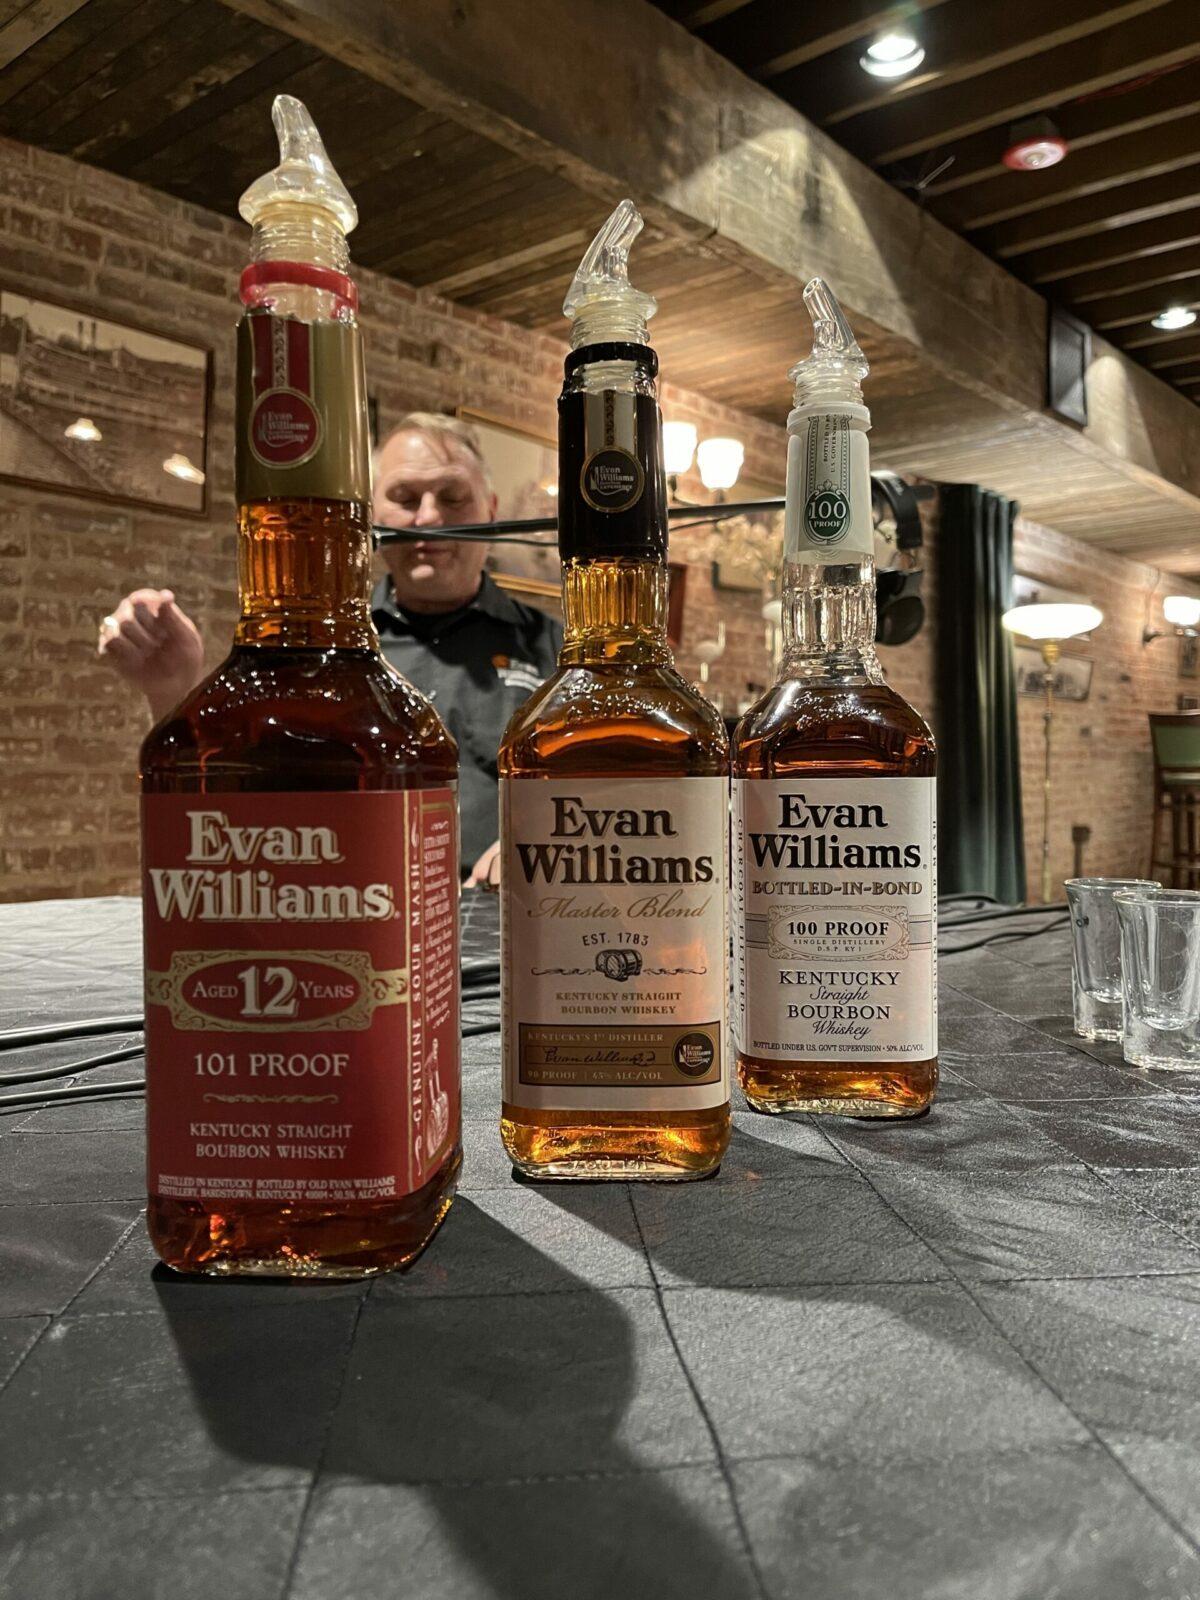 Evan Williams Experience with Bernie Lubbers and Jody Filiatreau